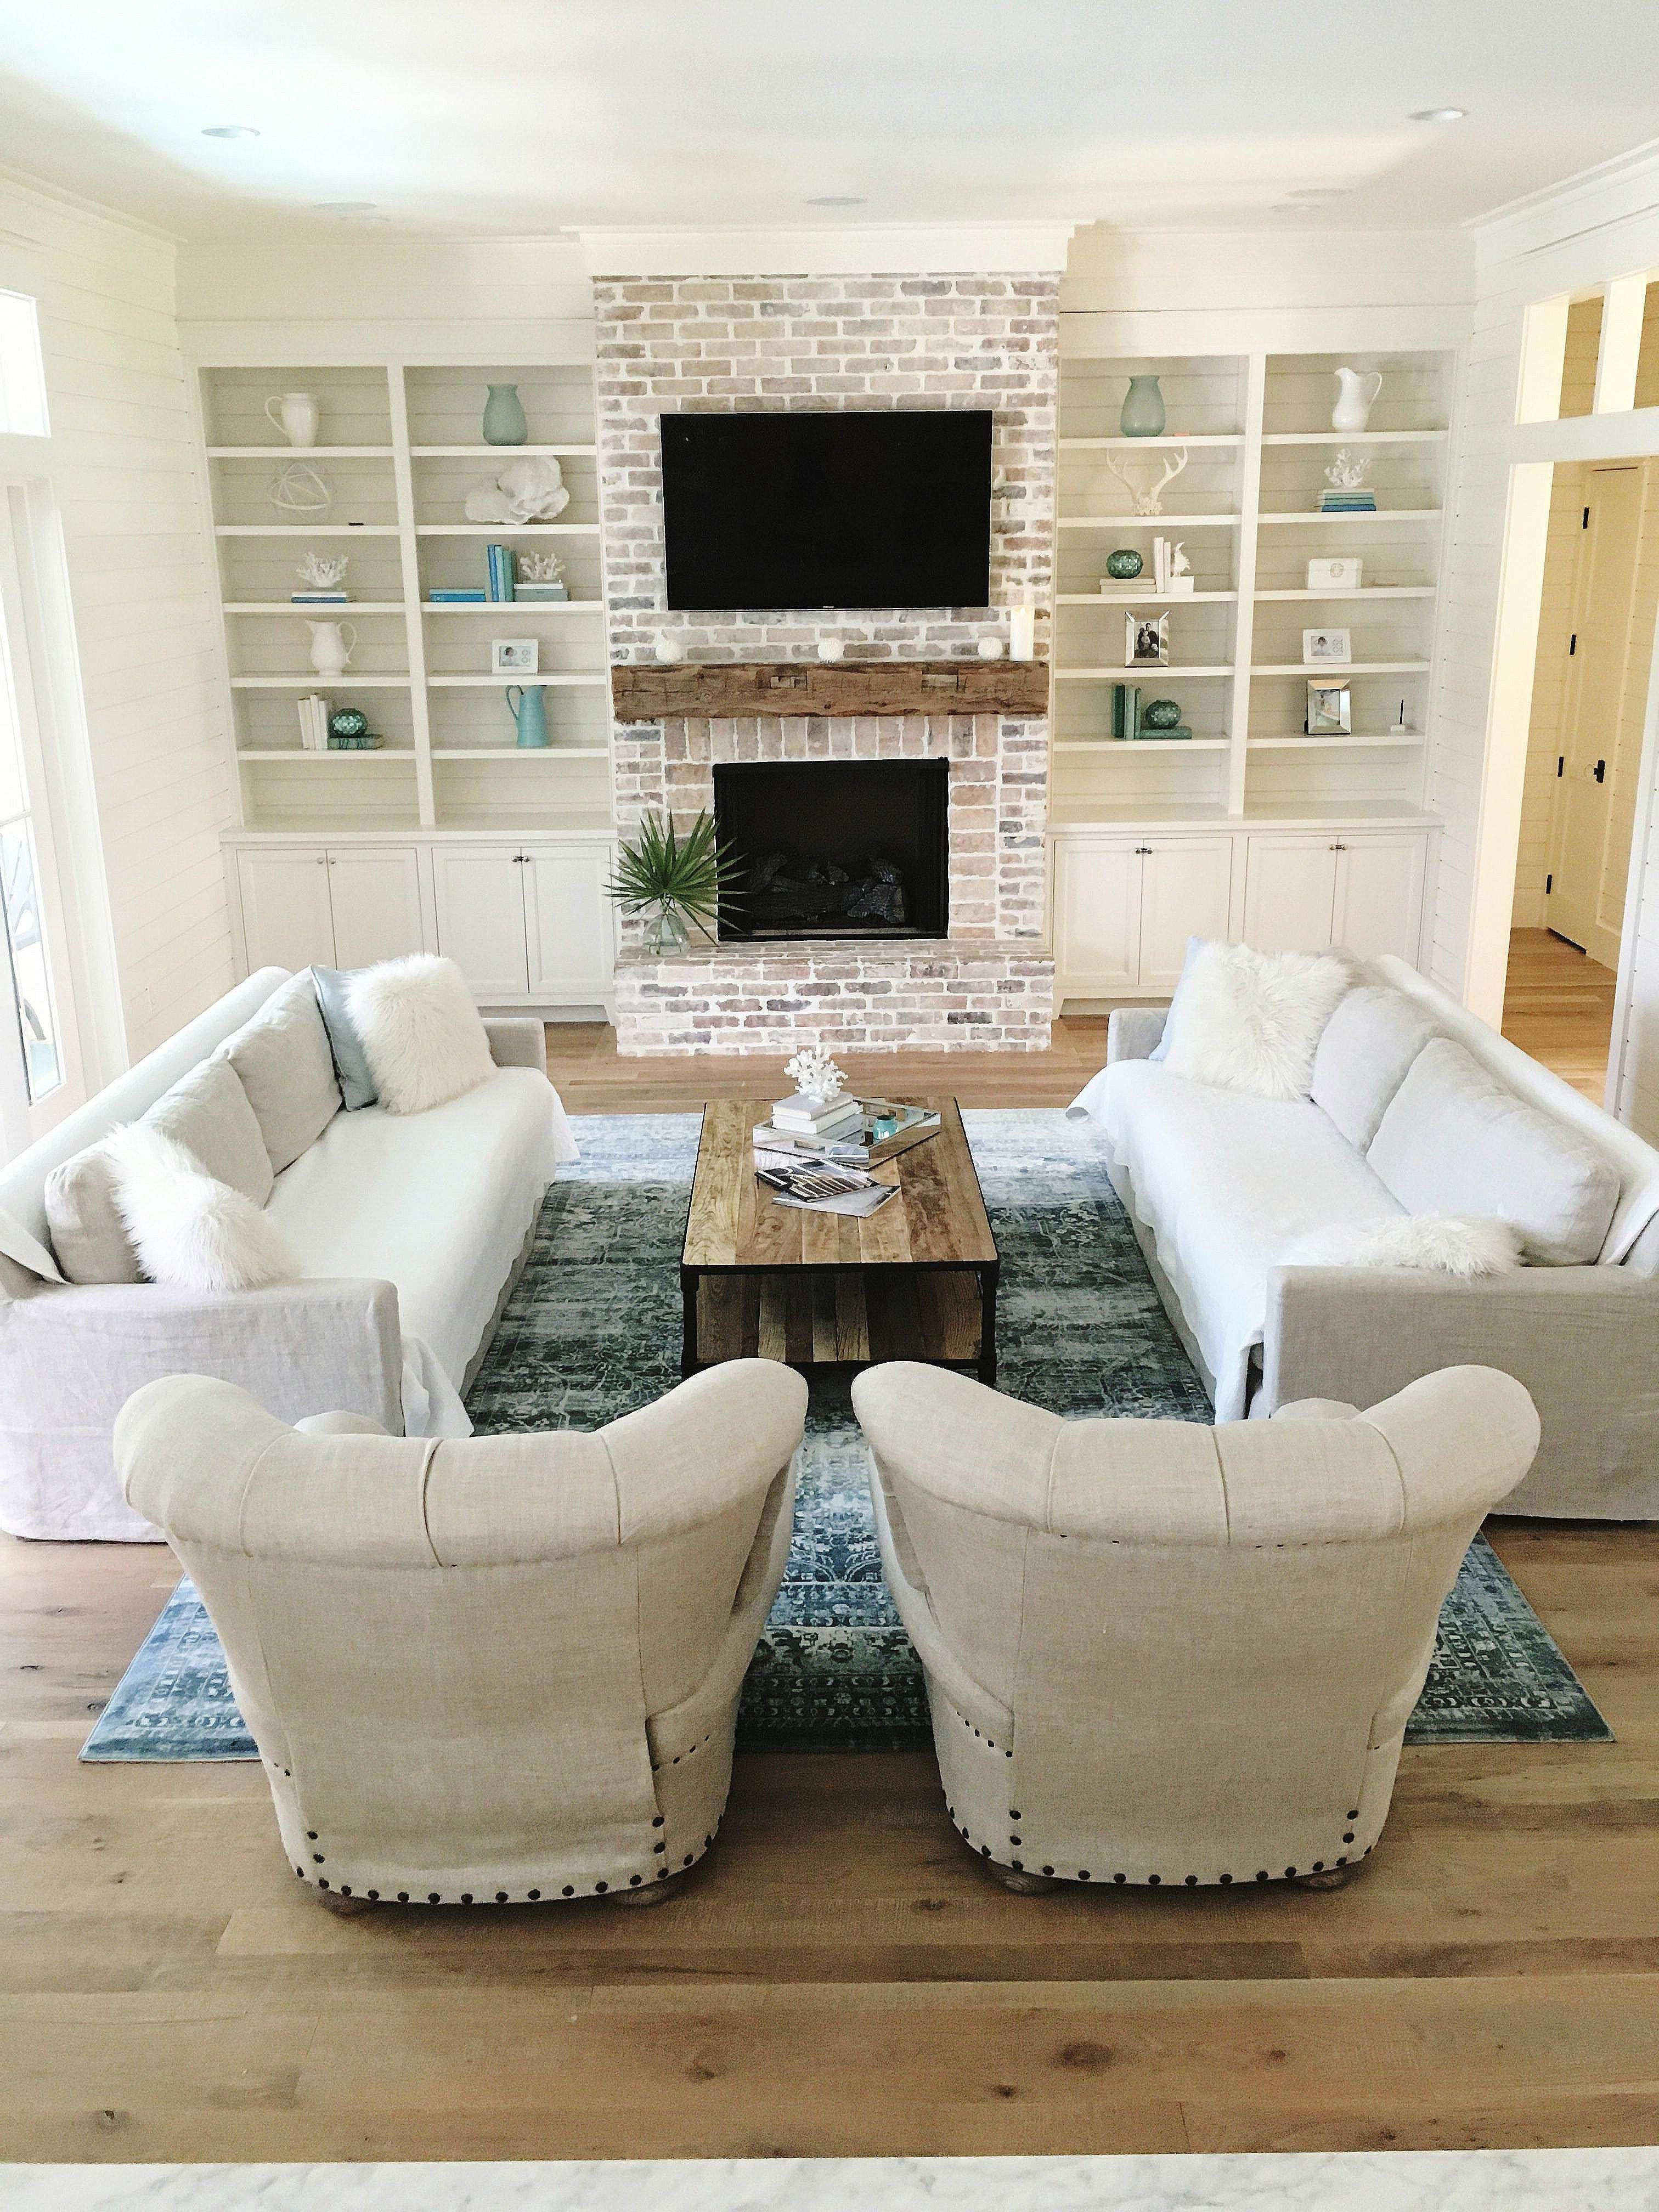 22 Lovely Hardwood Floor Options Home   Unique Flooring Ideas